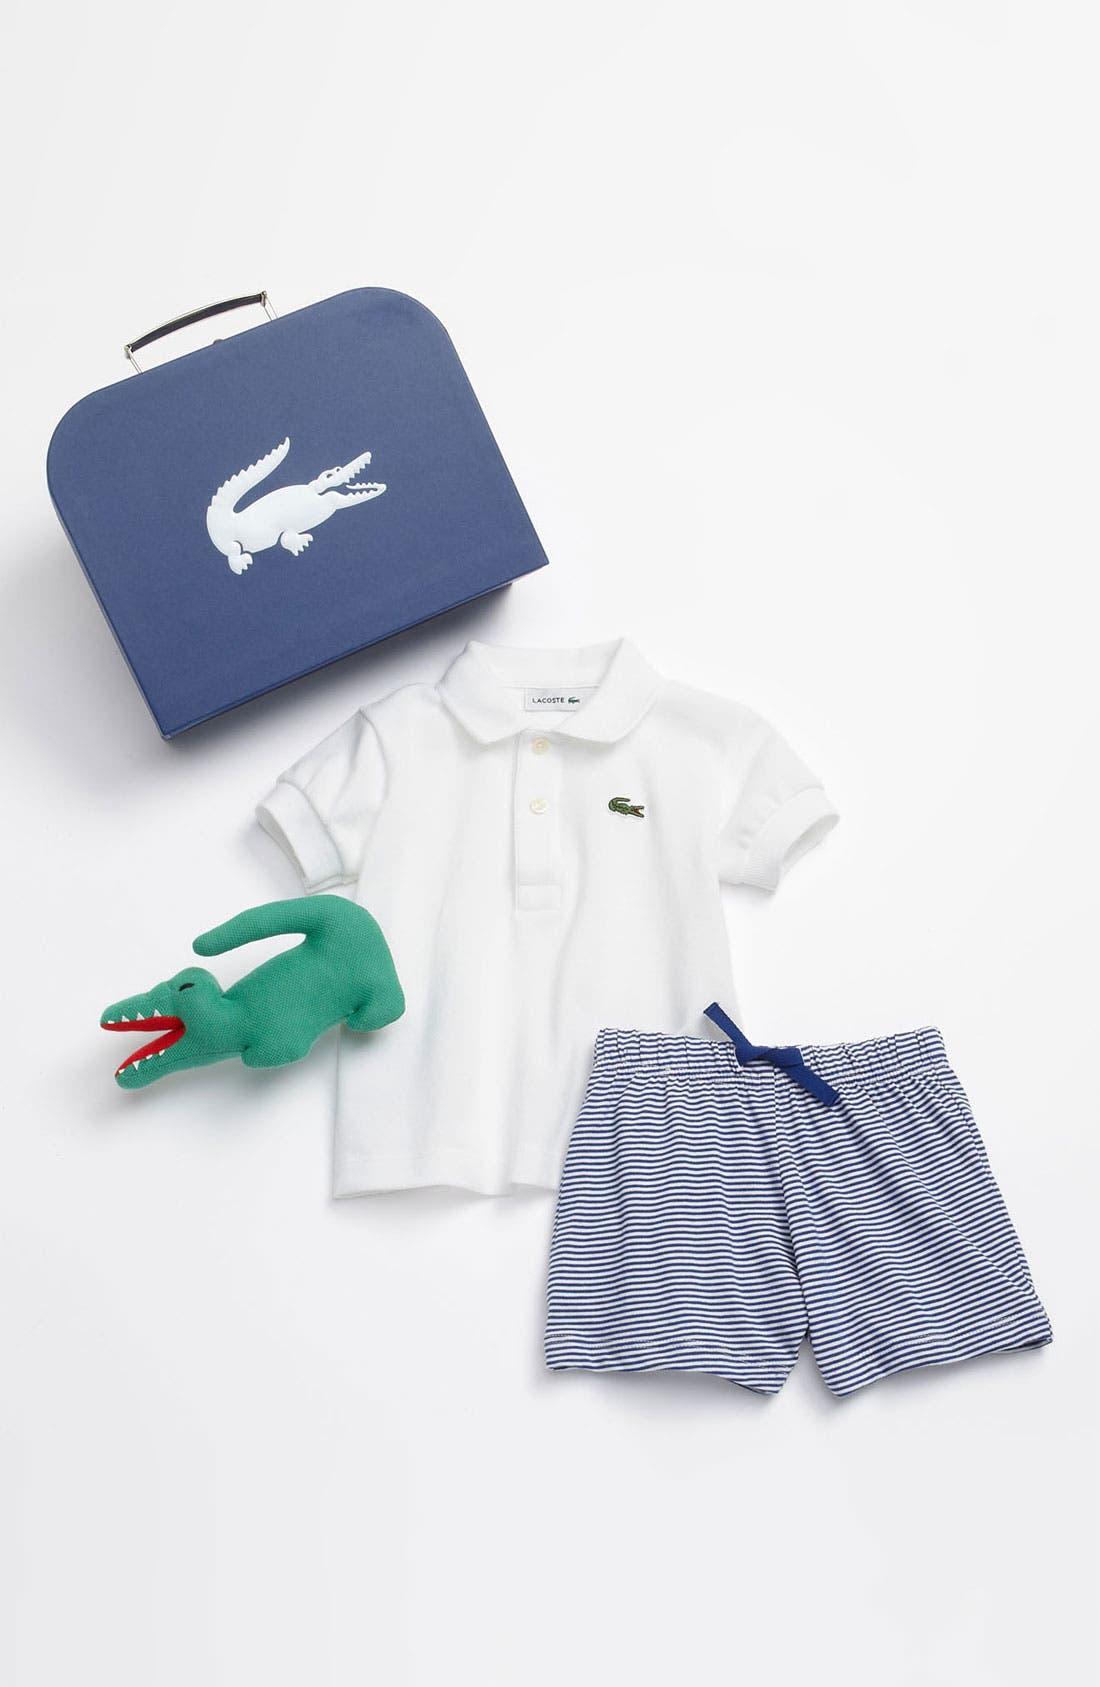 Main Image - Lacoste Polo & Shorts (Baby)